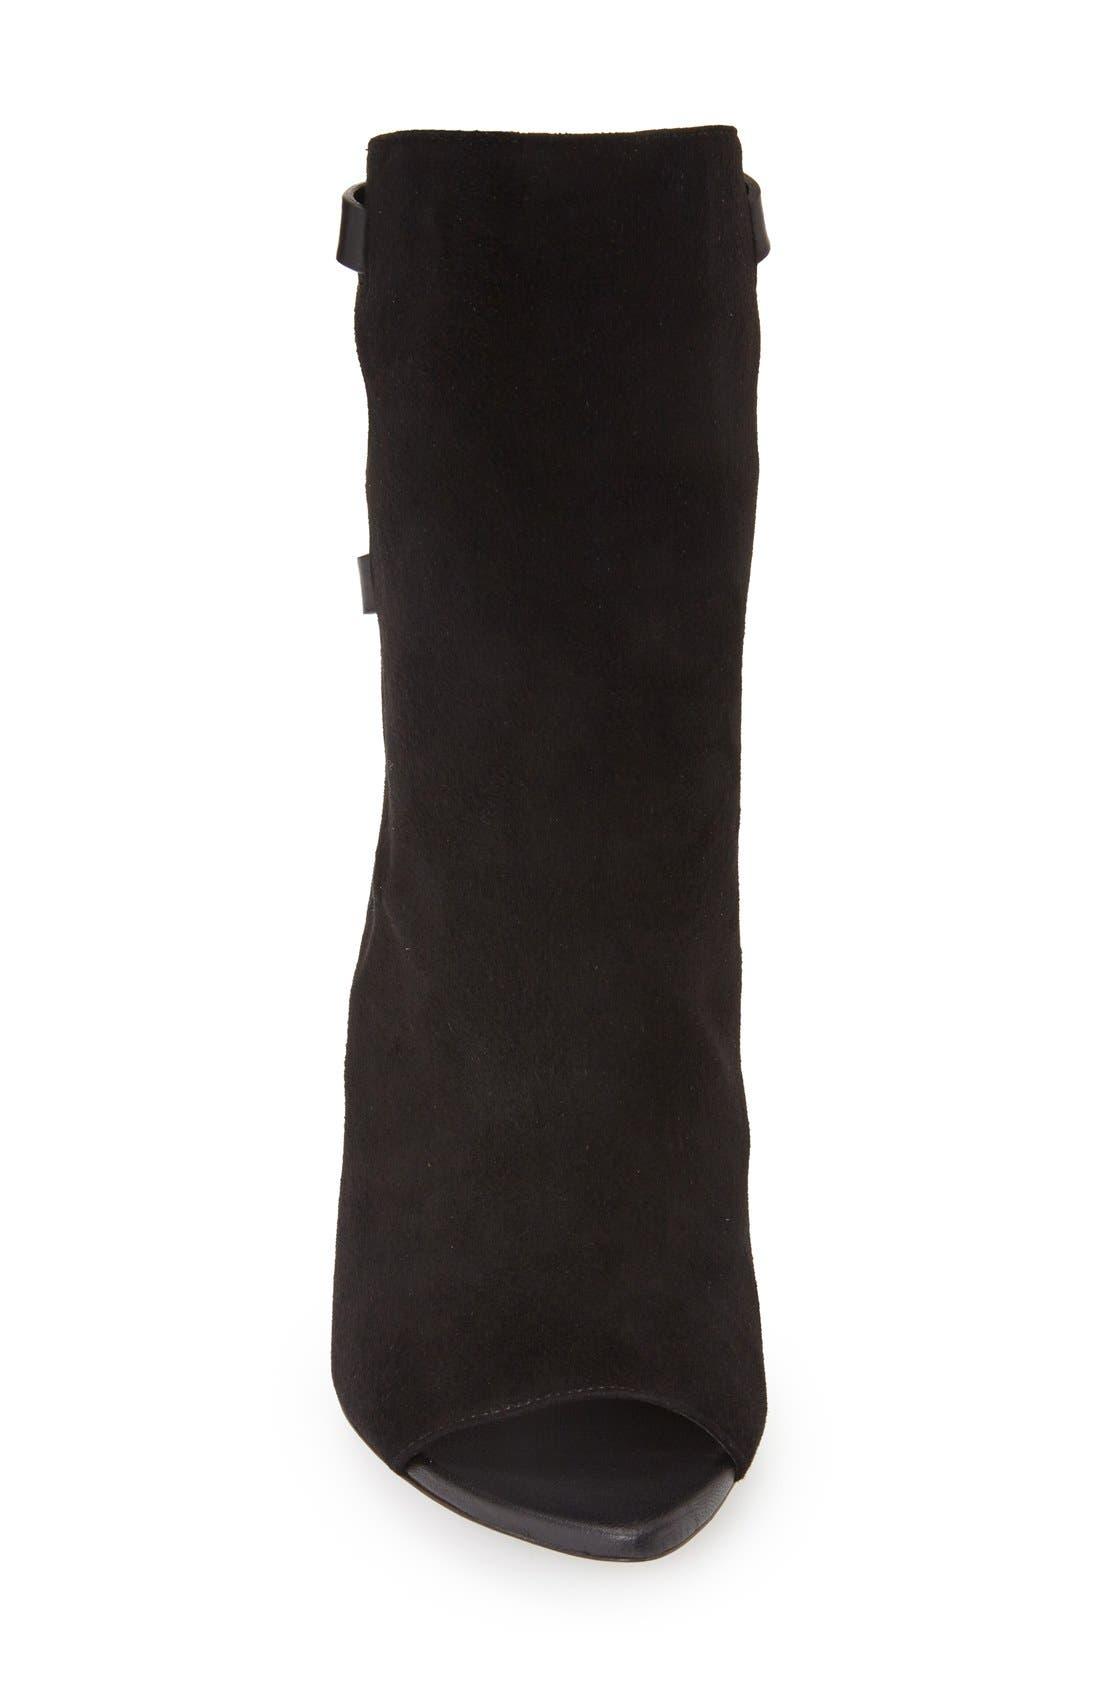 Alternate Image 3  - Proenza Schouler 'Selvino' Peep Toe Boot (Women)